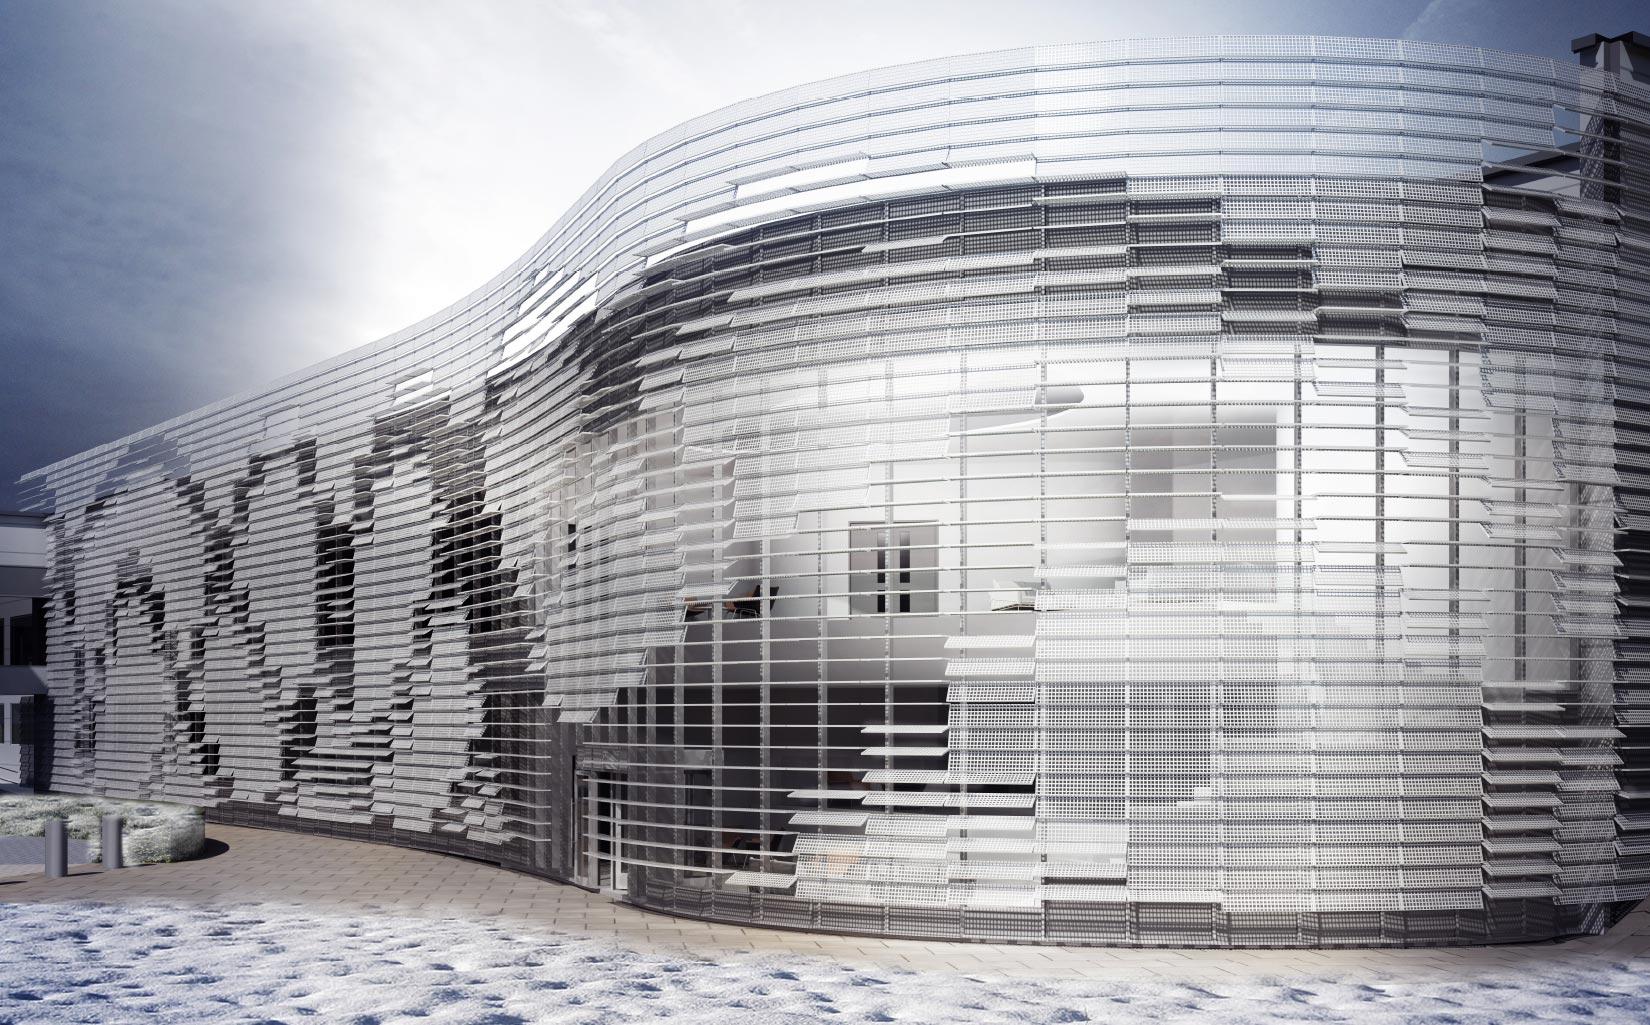 Unilever Advanced Manufacturing Centre, Proposed design concept